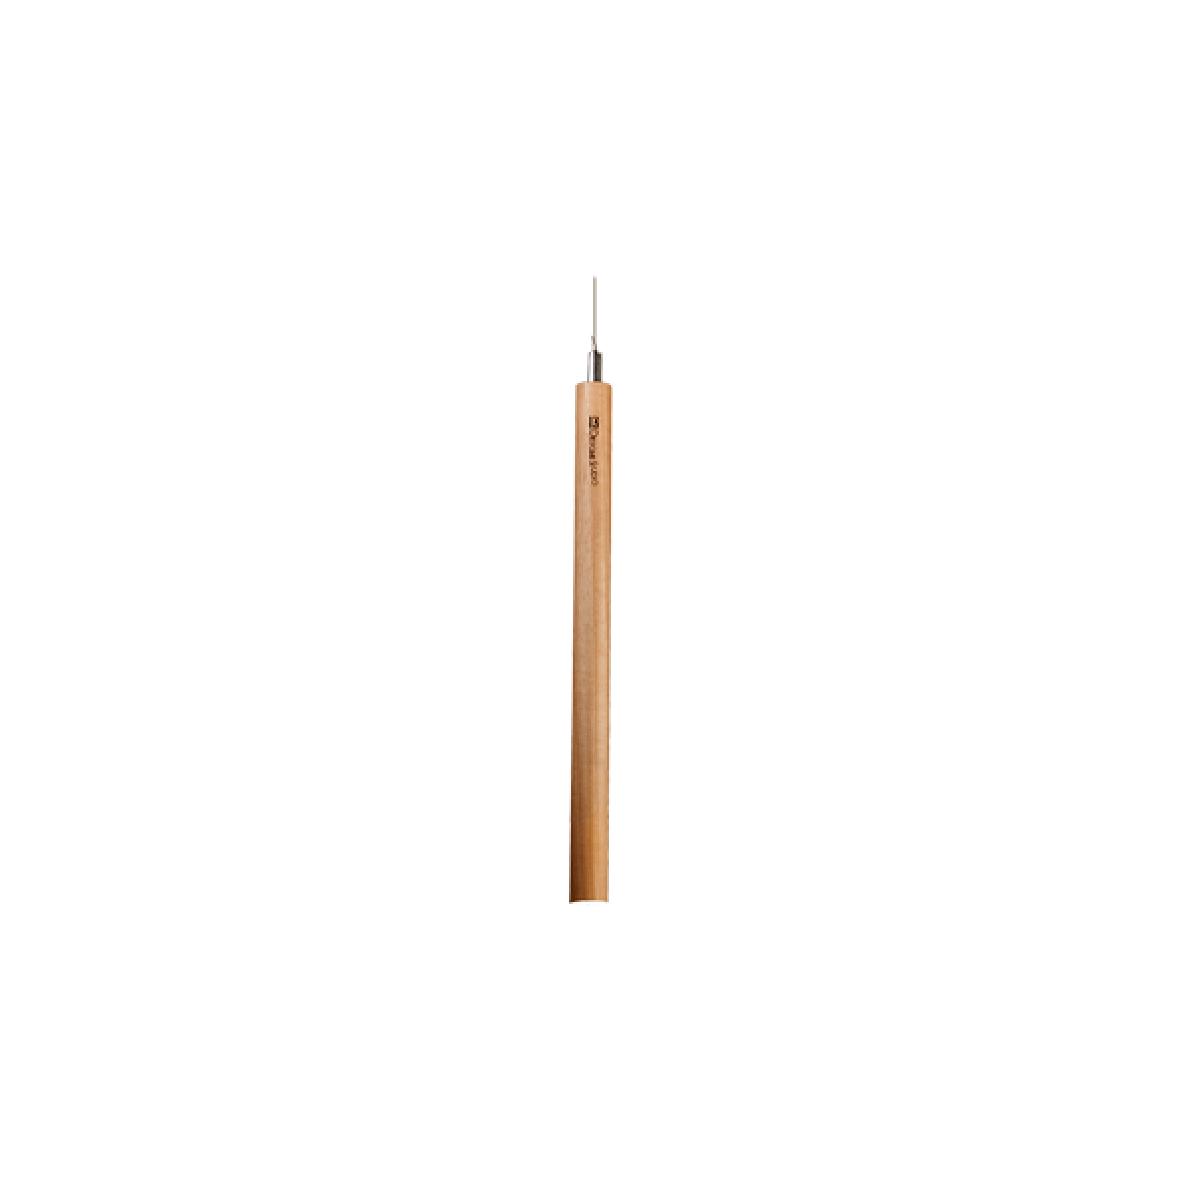 چراغ دکوراتیو چوبی SO-1381-40CM-Sآویز